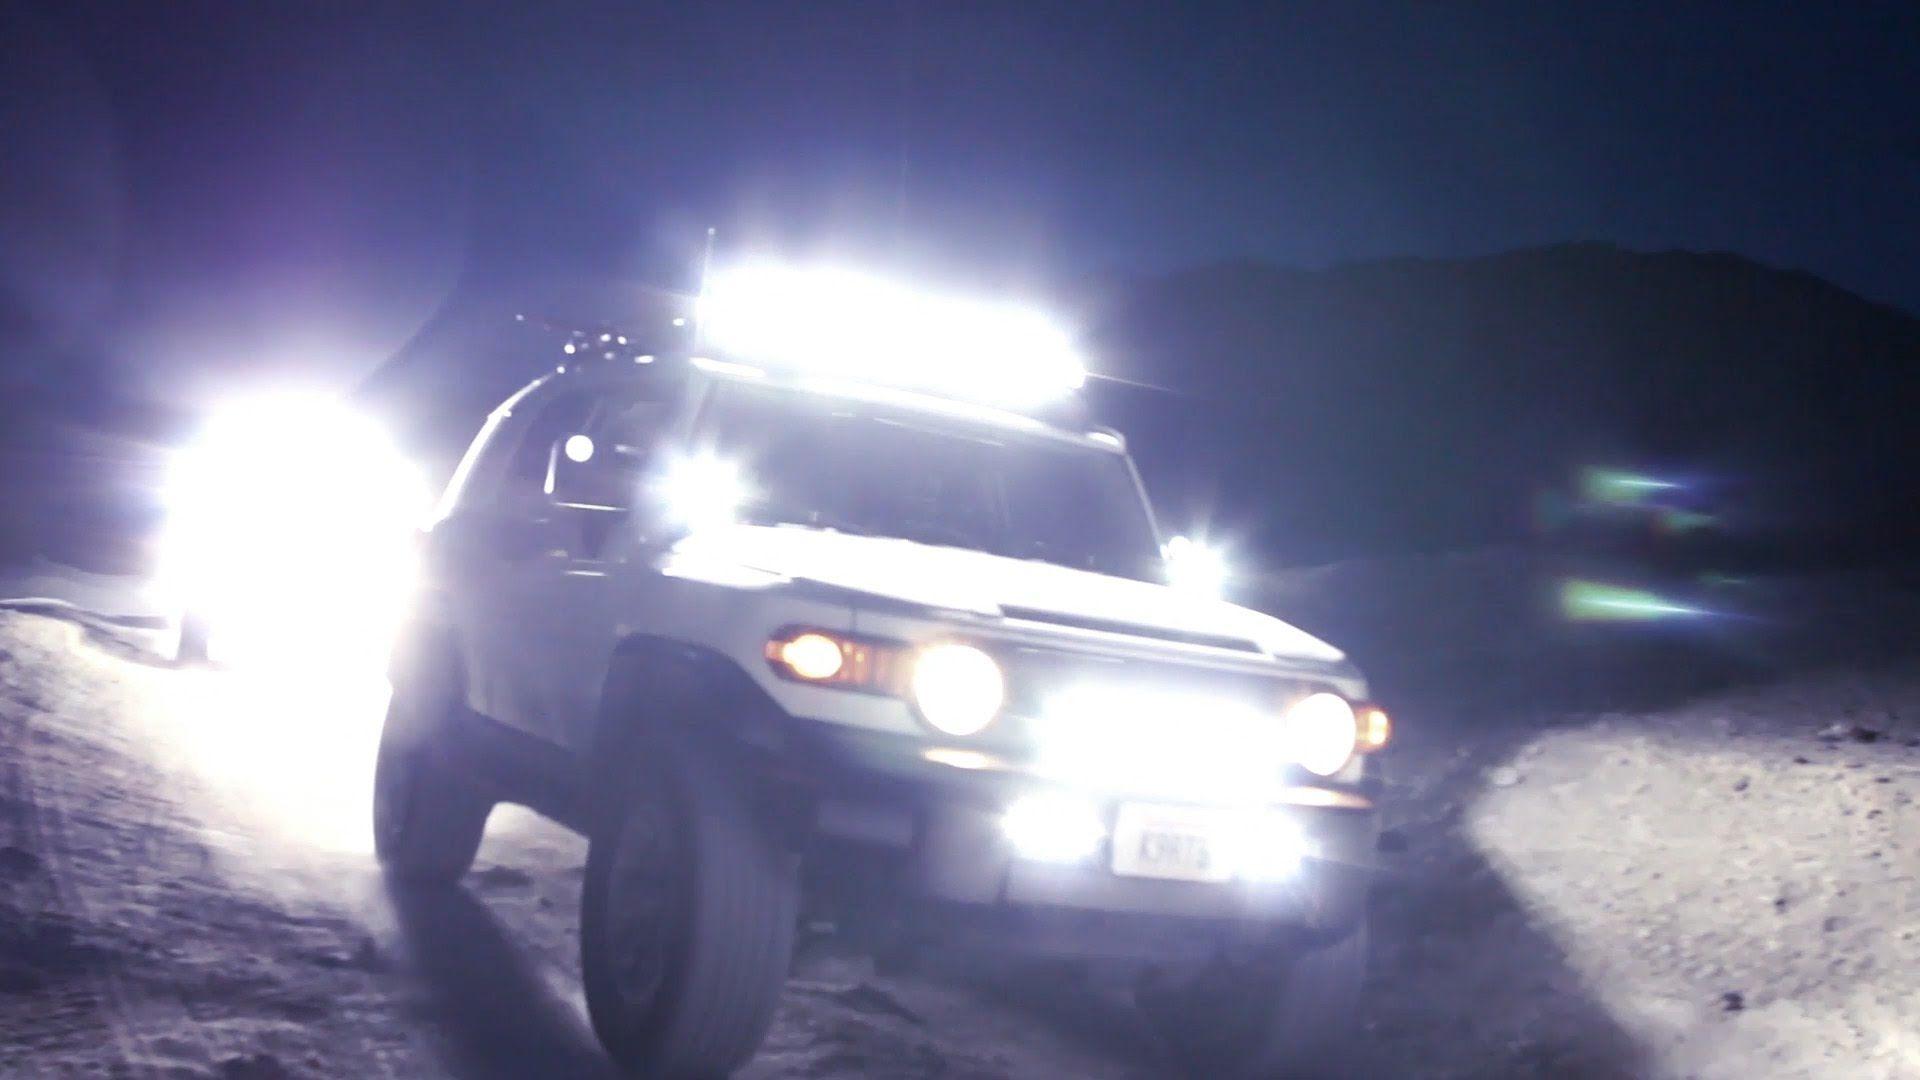 Off Road LED Light Bars - LAMPHUS ® Maverix ™ The Journey of Light ...